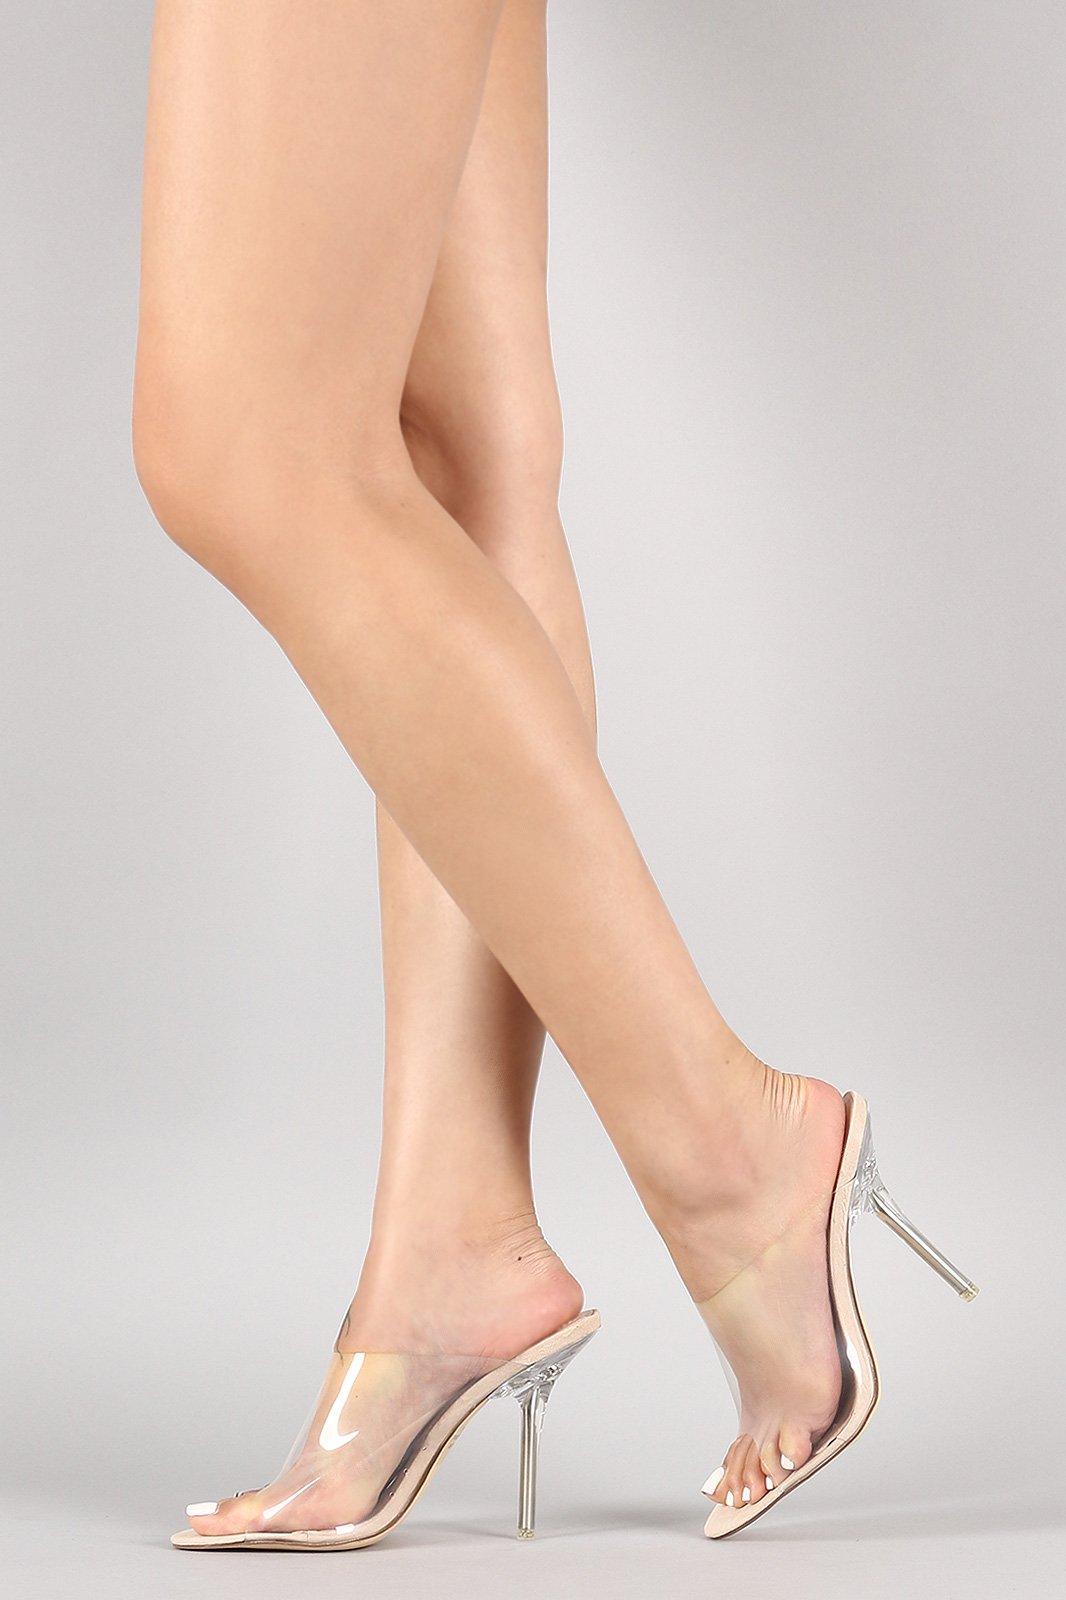 1fa2c07da Transparent Open Toe Stiletto Mule Heel | Outfits in 2019 | Heels ...